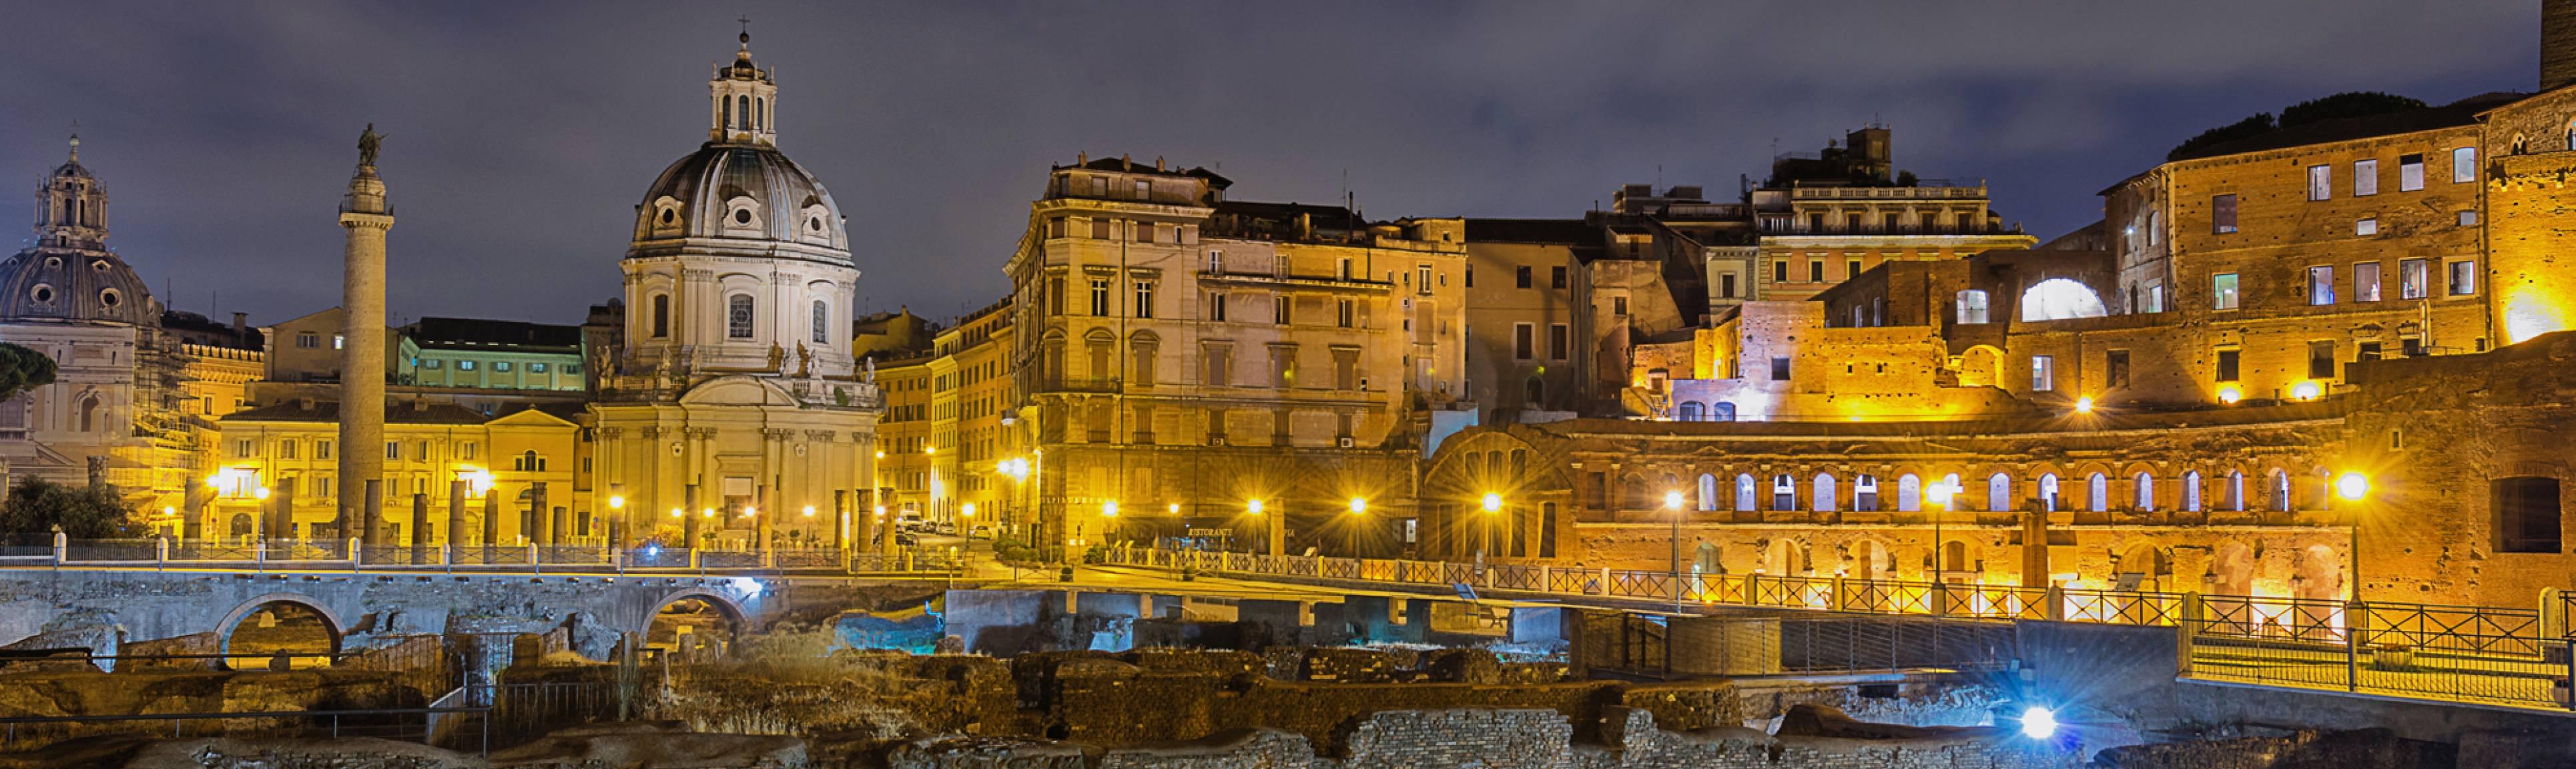 Illuminated night view of the ancient Roman Forum